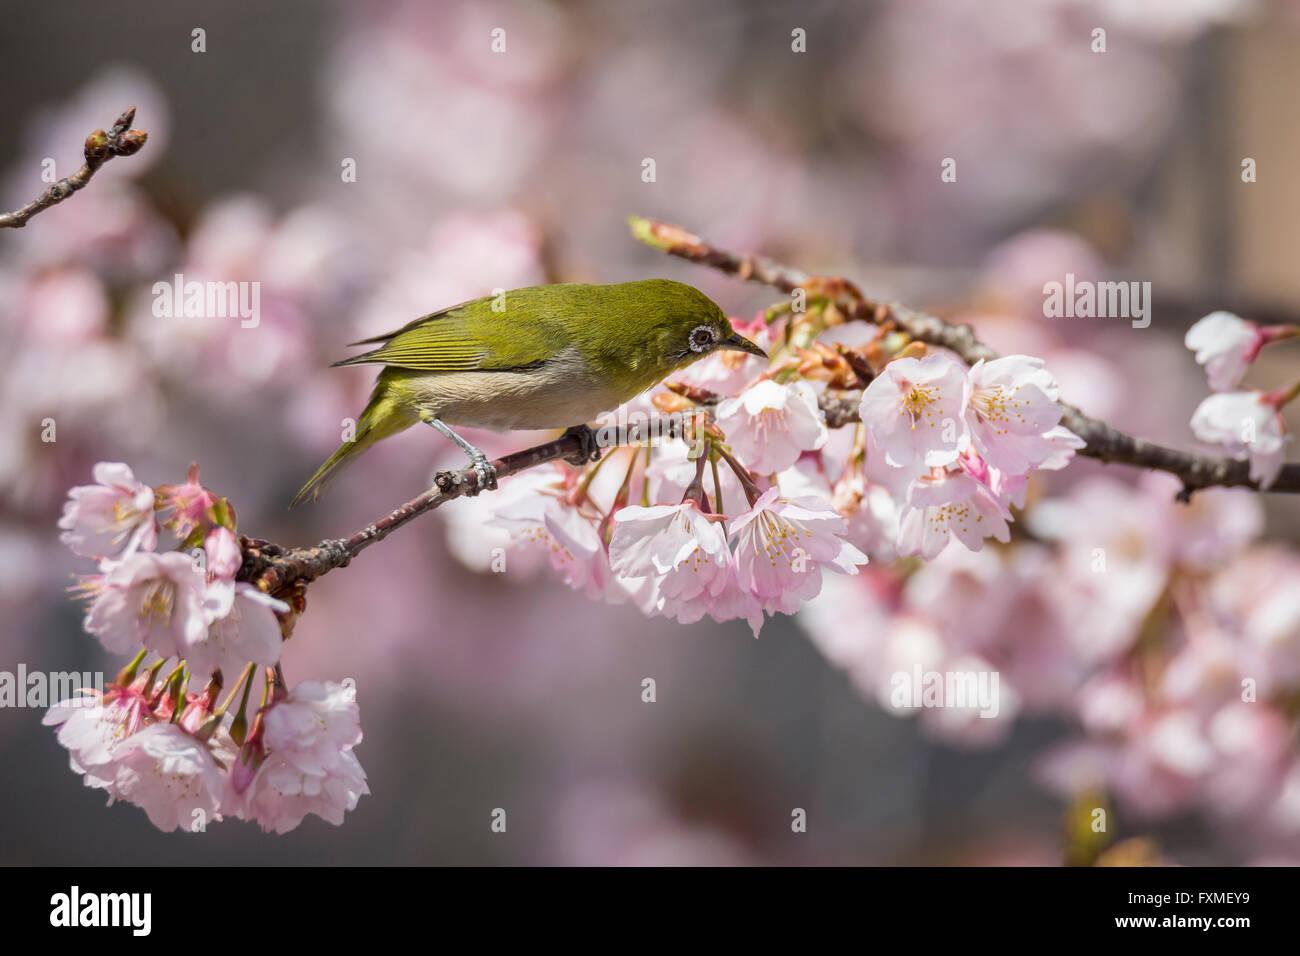 Cherry Blossoms in Sumida Park, Asakusa, Tokyo, Japan - Stock Image